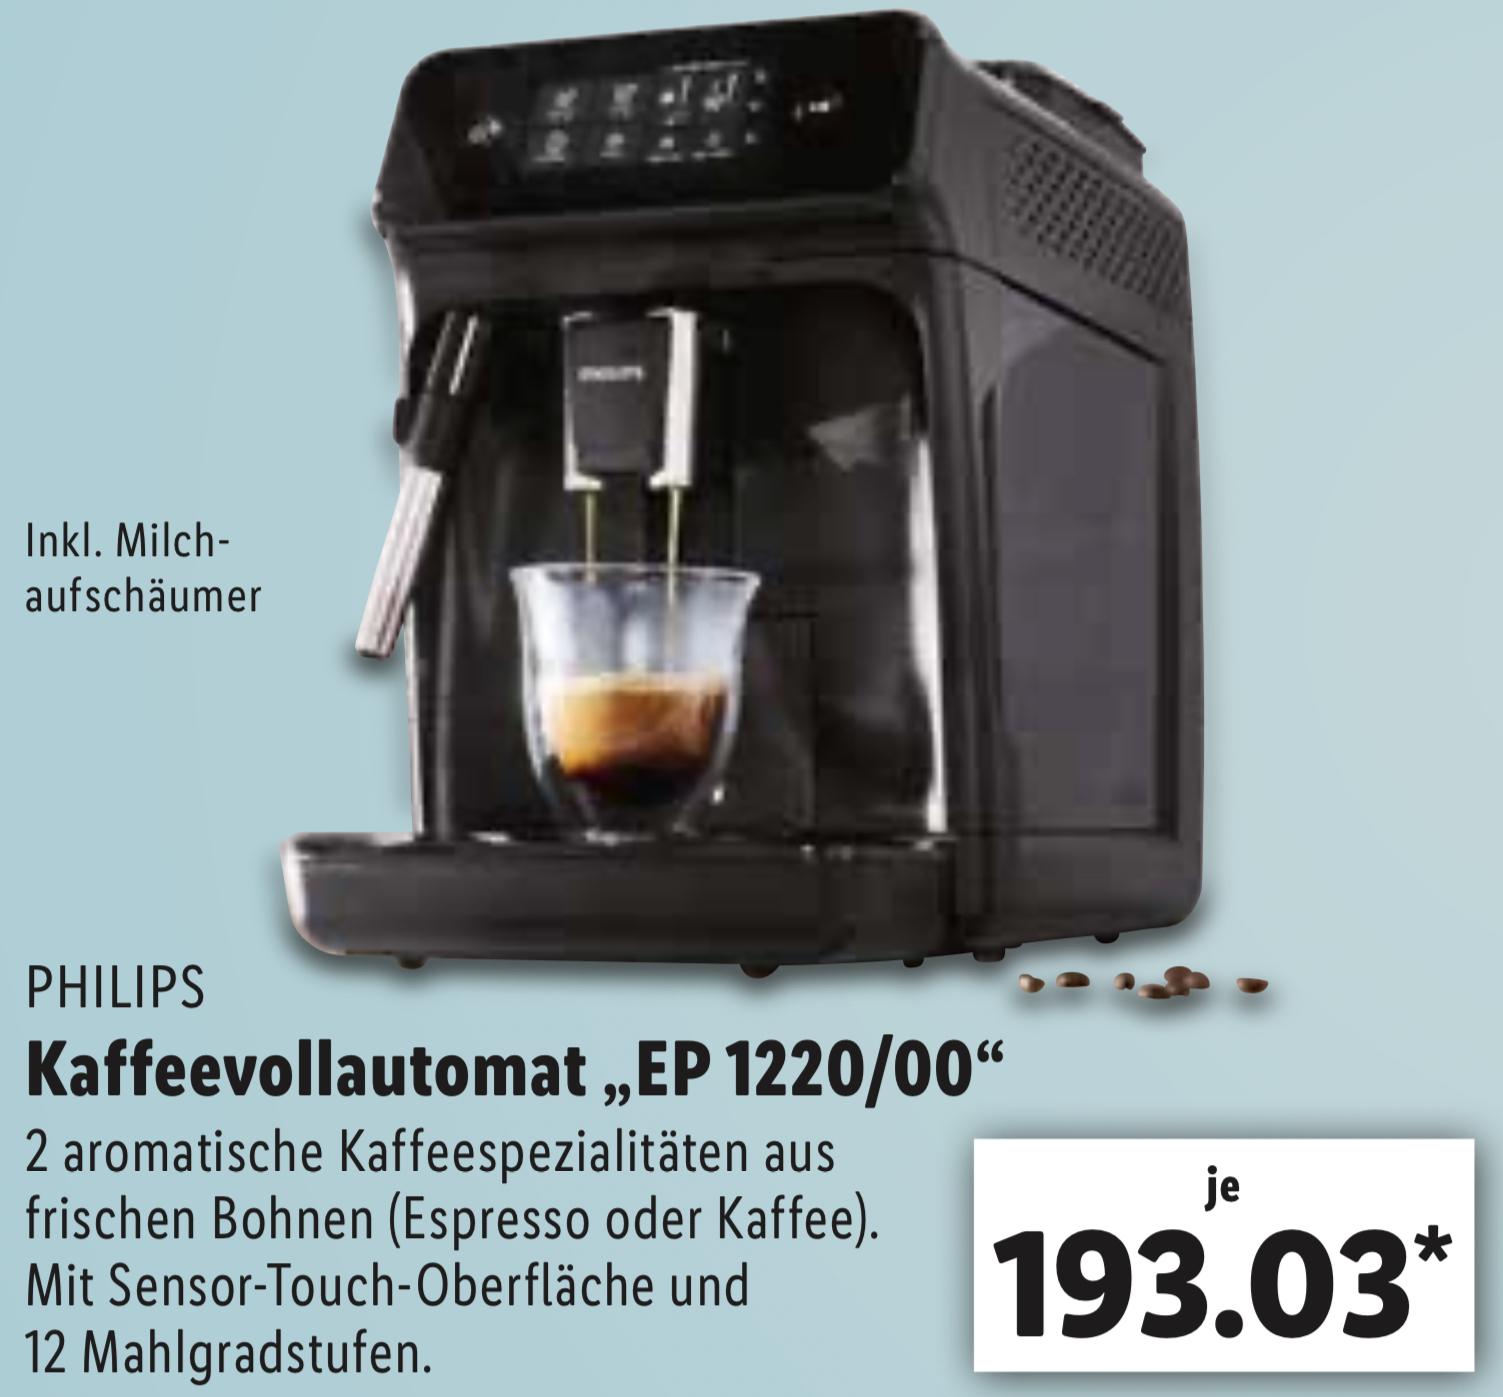 [Lokal LIDL] PHILIPS Kaffeevollautomat EP1220/00 mit herausnehmbarer Brühgruppe für 188,03€ - ab 09.11. Frankfurt M. / 12.11. Nürnberg usw.